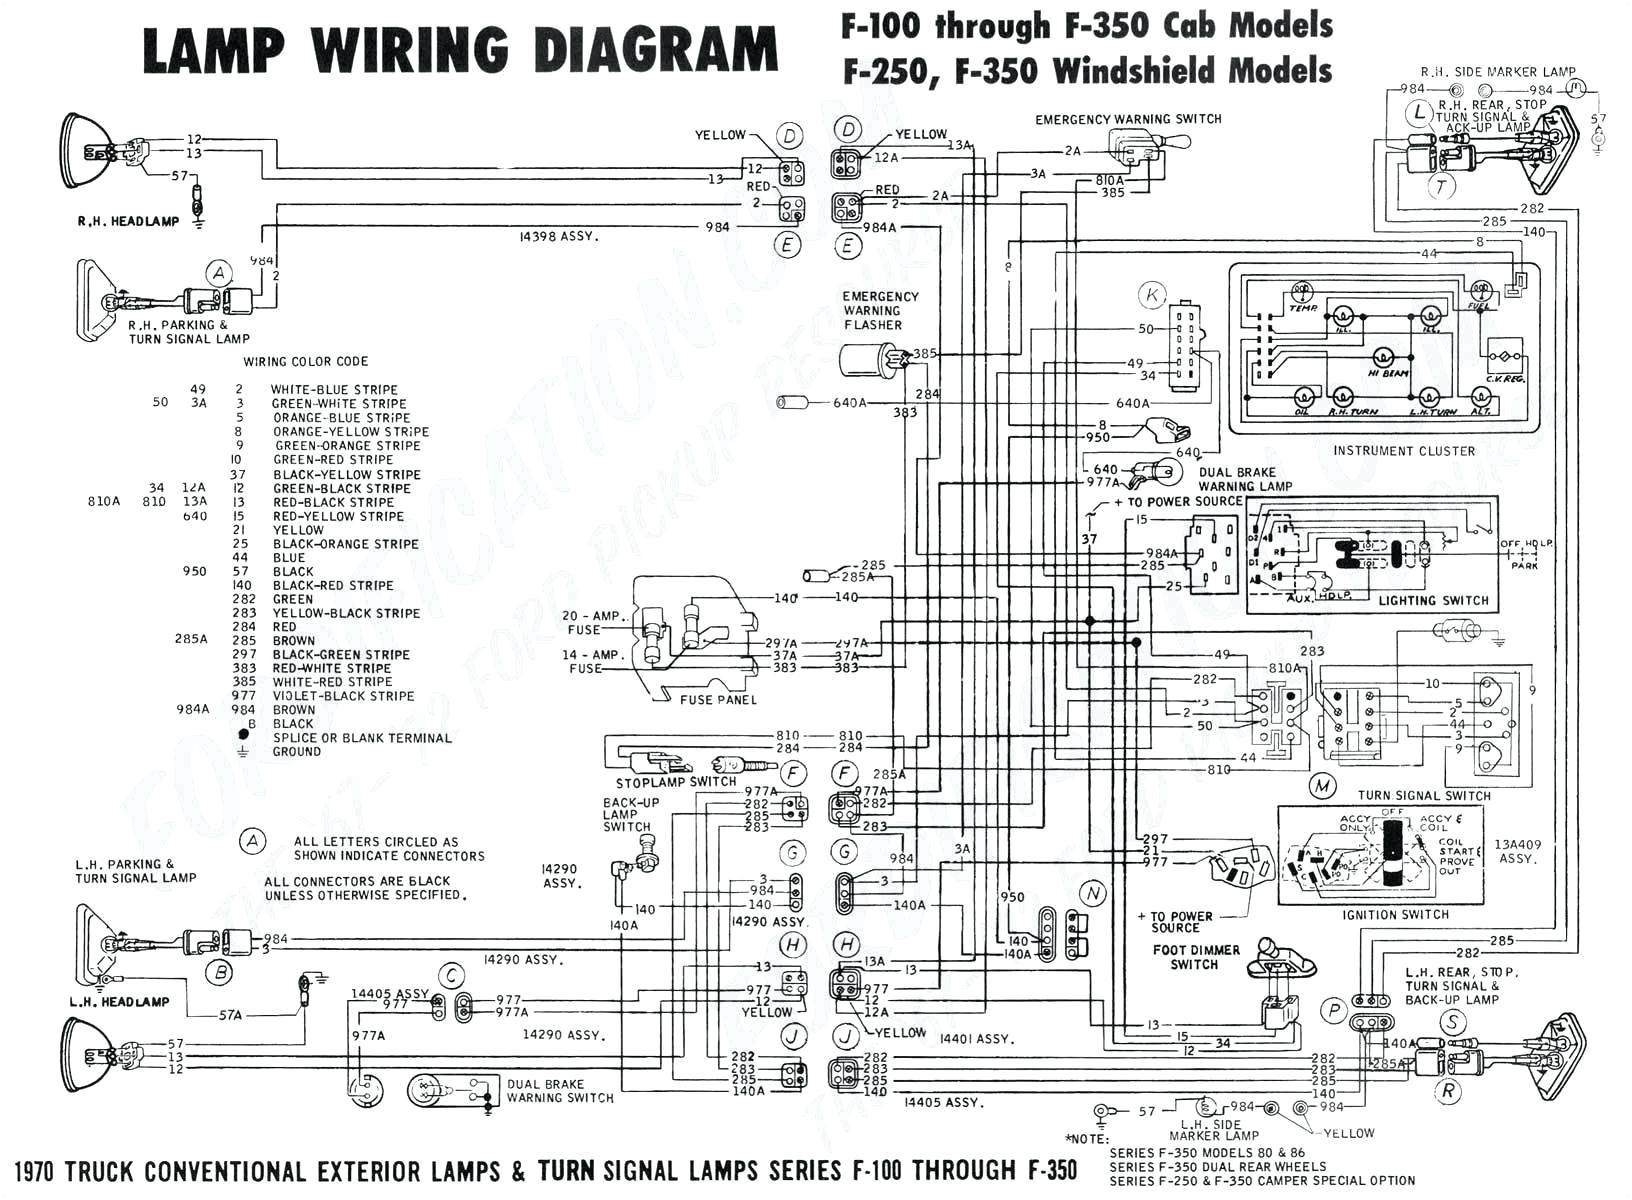 2005 Chevy Silverado Stereo Wiring Diagram 27i27l 3 Way Switch Wiring 2007 Gmc Canyon Radio Wiring